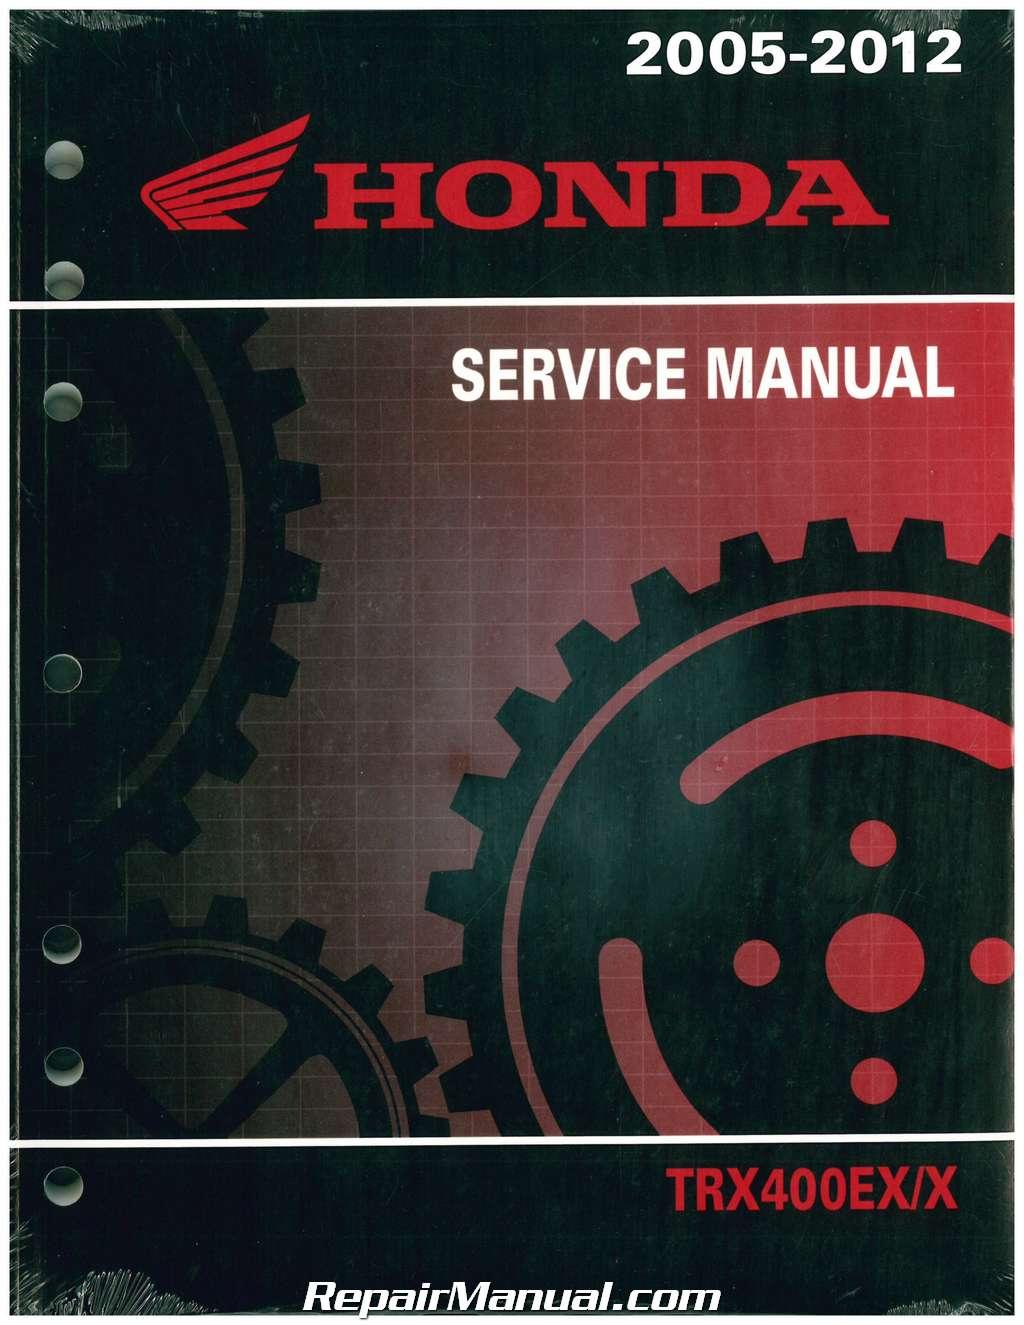 2005 2014 Honda Trx400ex X Atv Service Manual 400ex Ignition Wiring Diagram